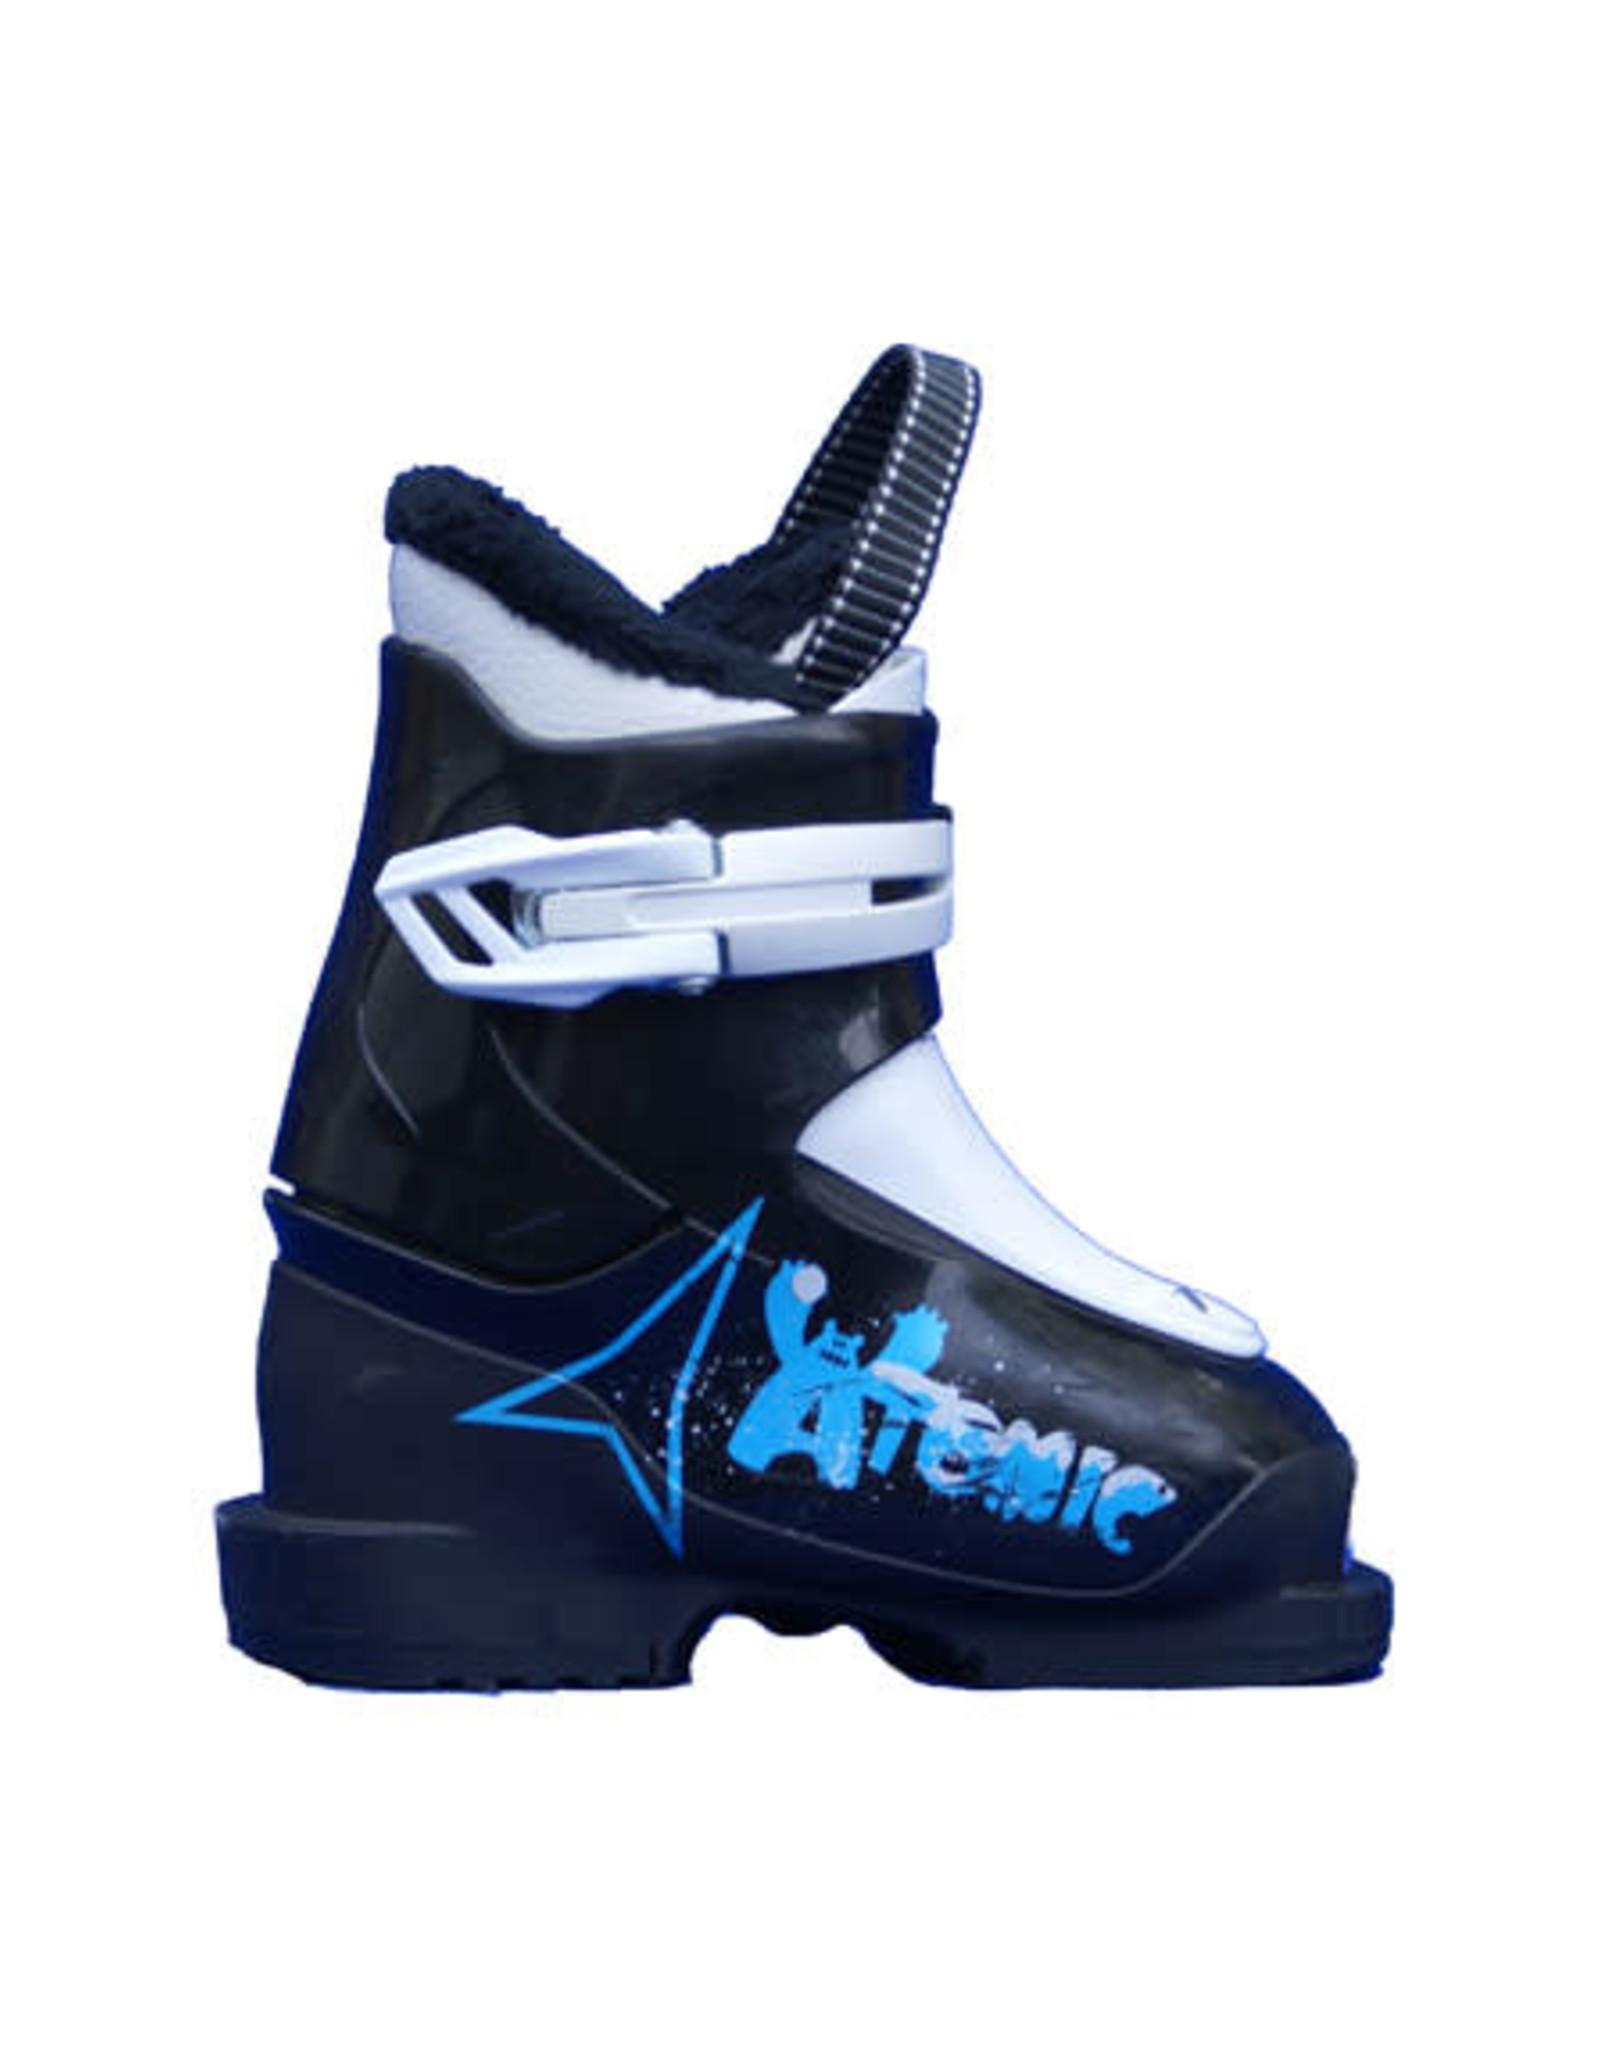 ATOMIC Skischoenen ATOMIC Sneeuwman (zw/blw) Gebruikt 25 (mondo 15)